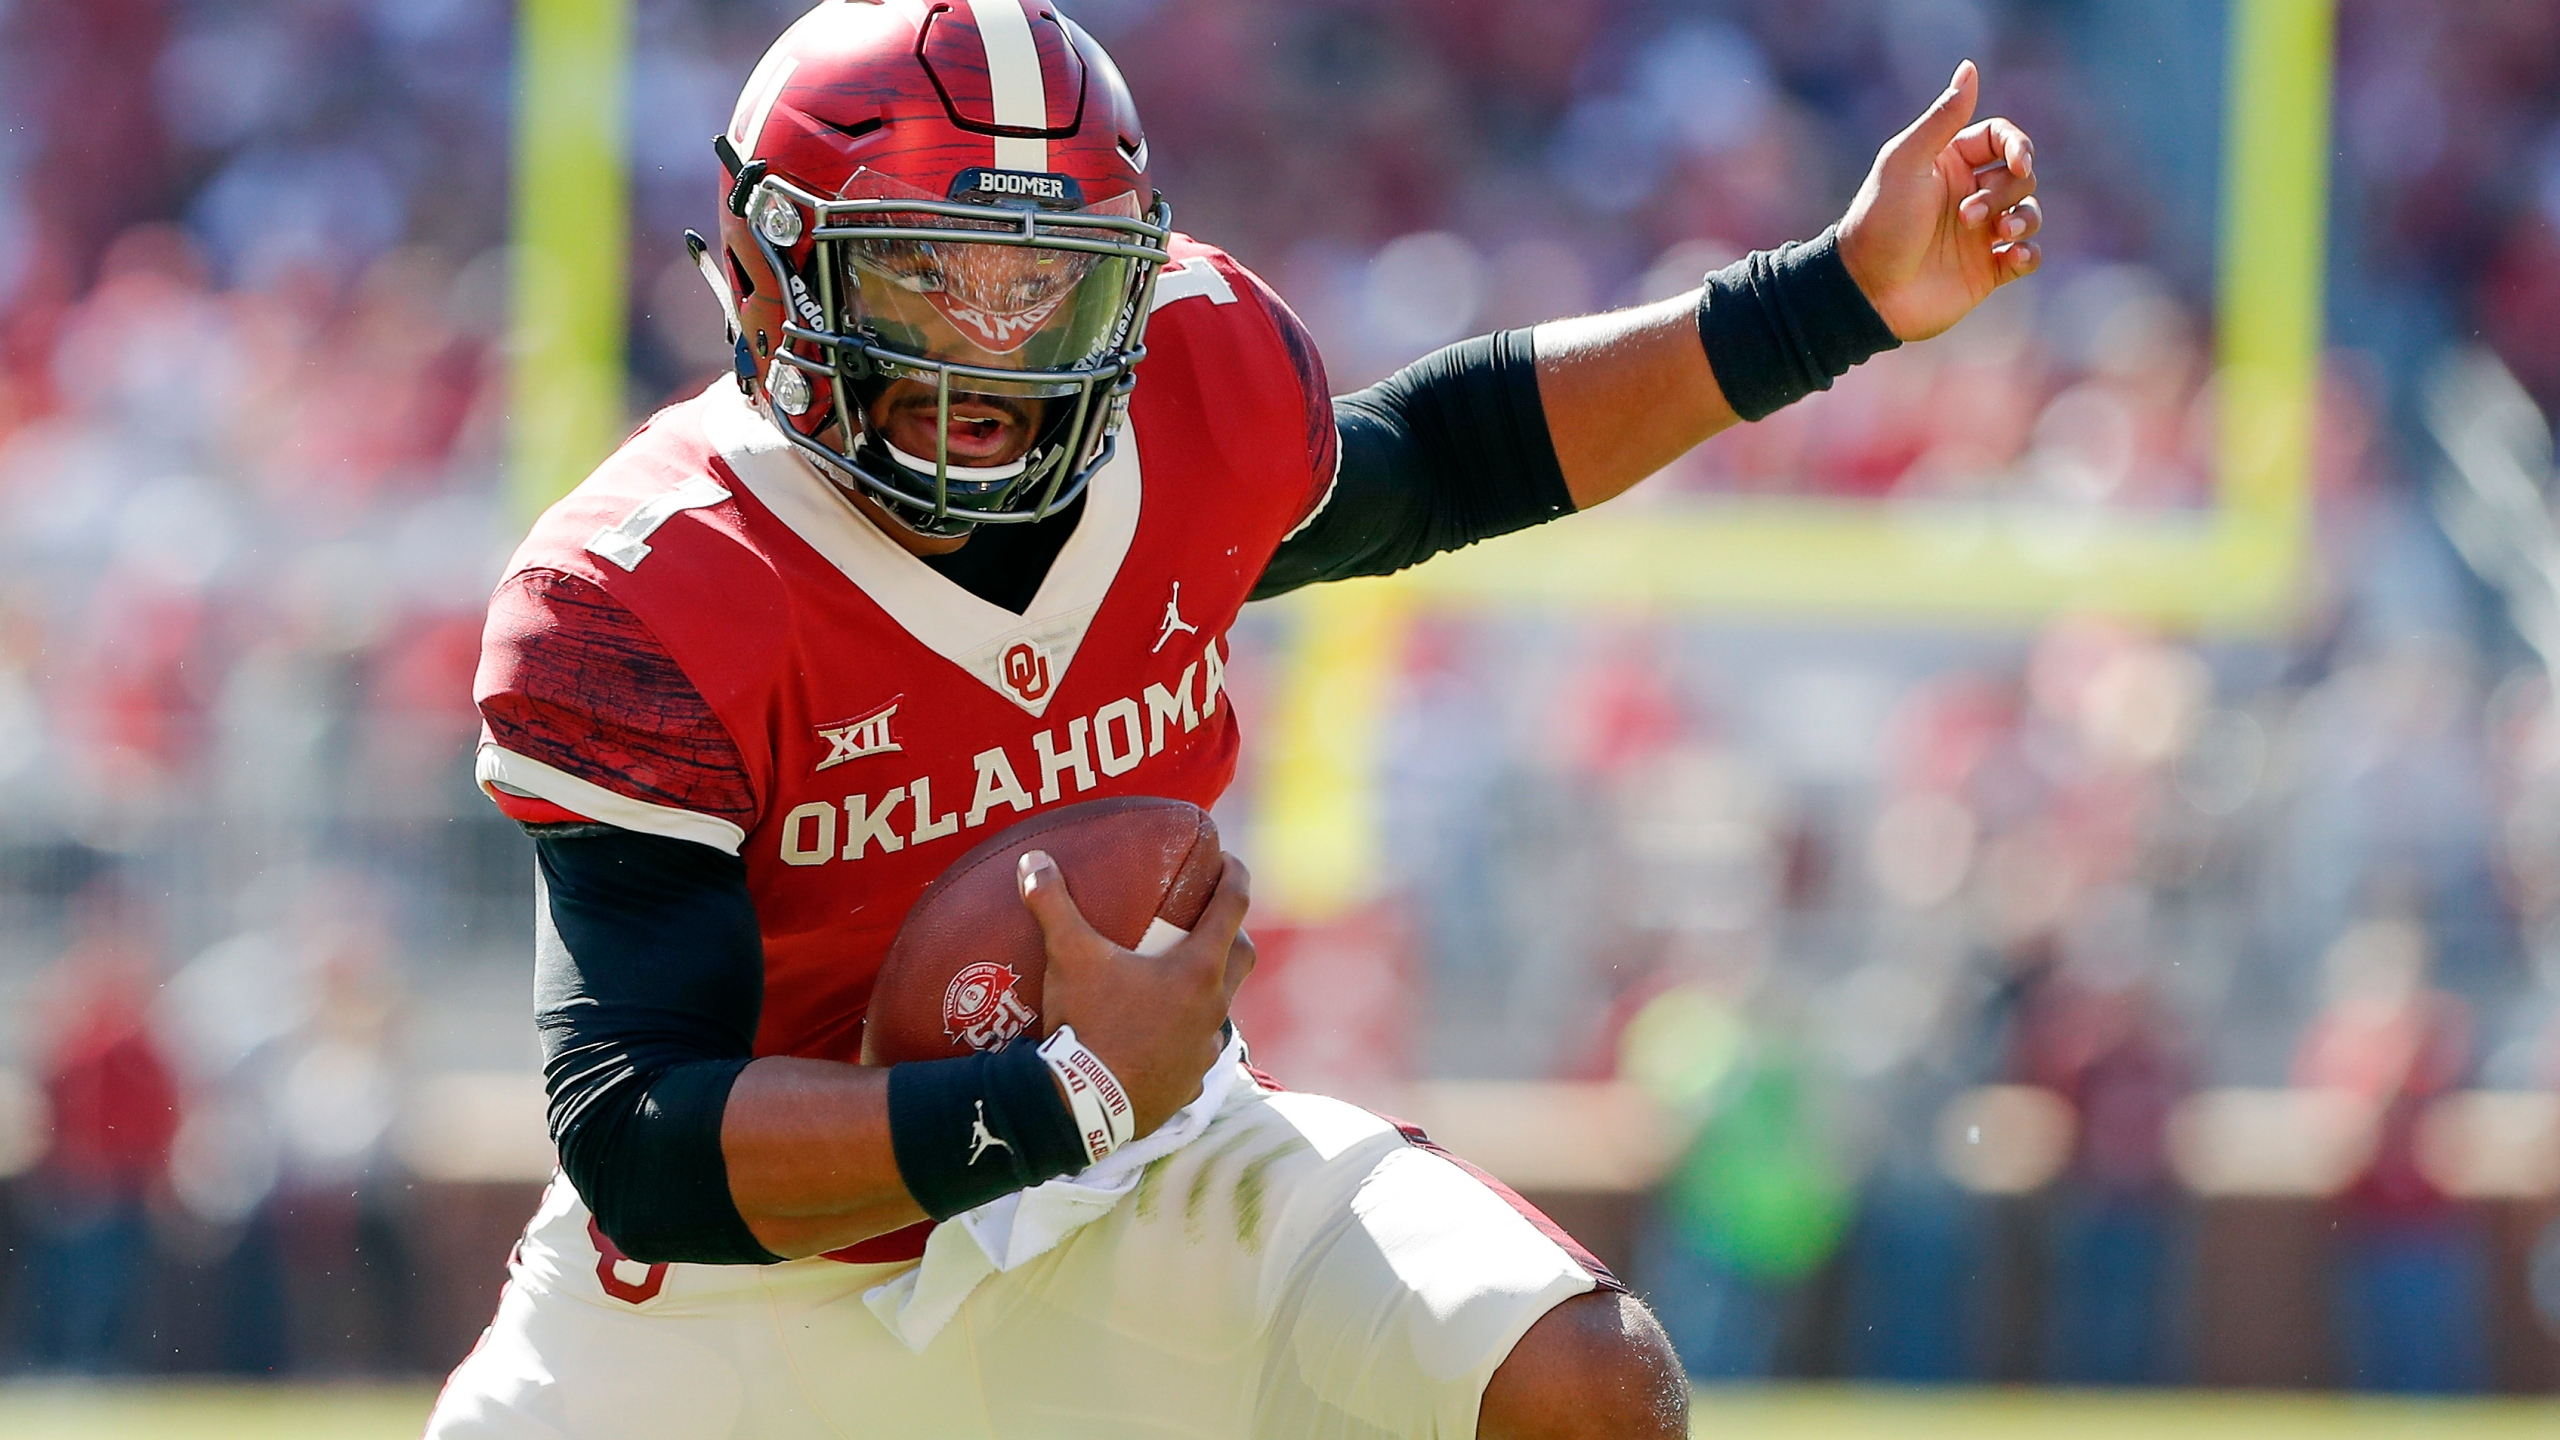 Oklahoma QB Jalen Hurts enjoying final